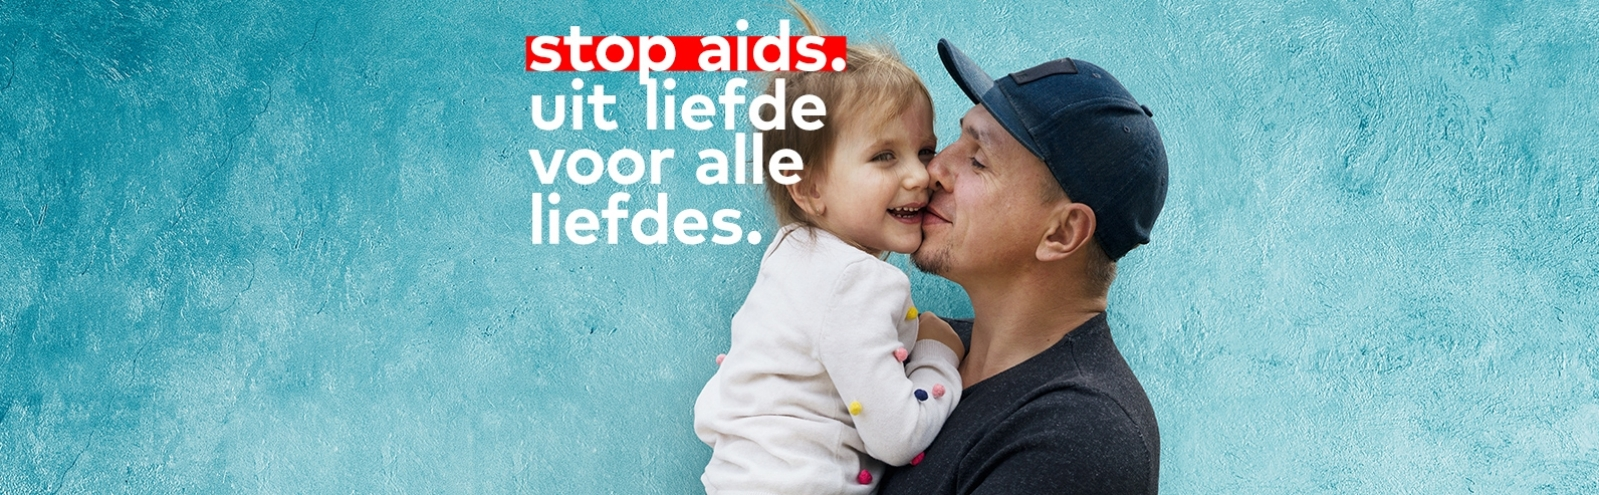 Igor - Sacha - tekst stop aids